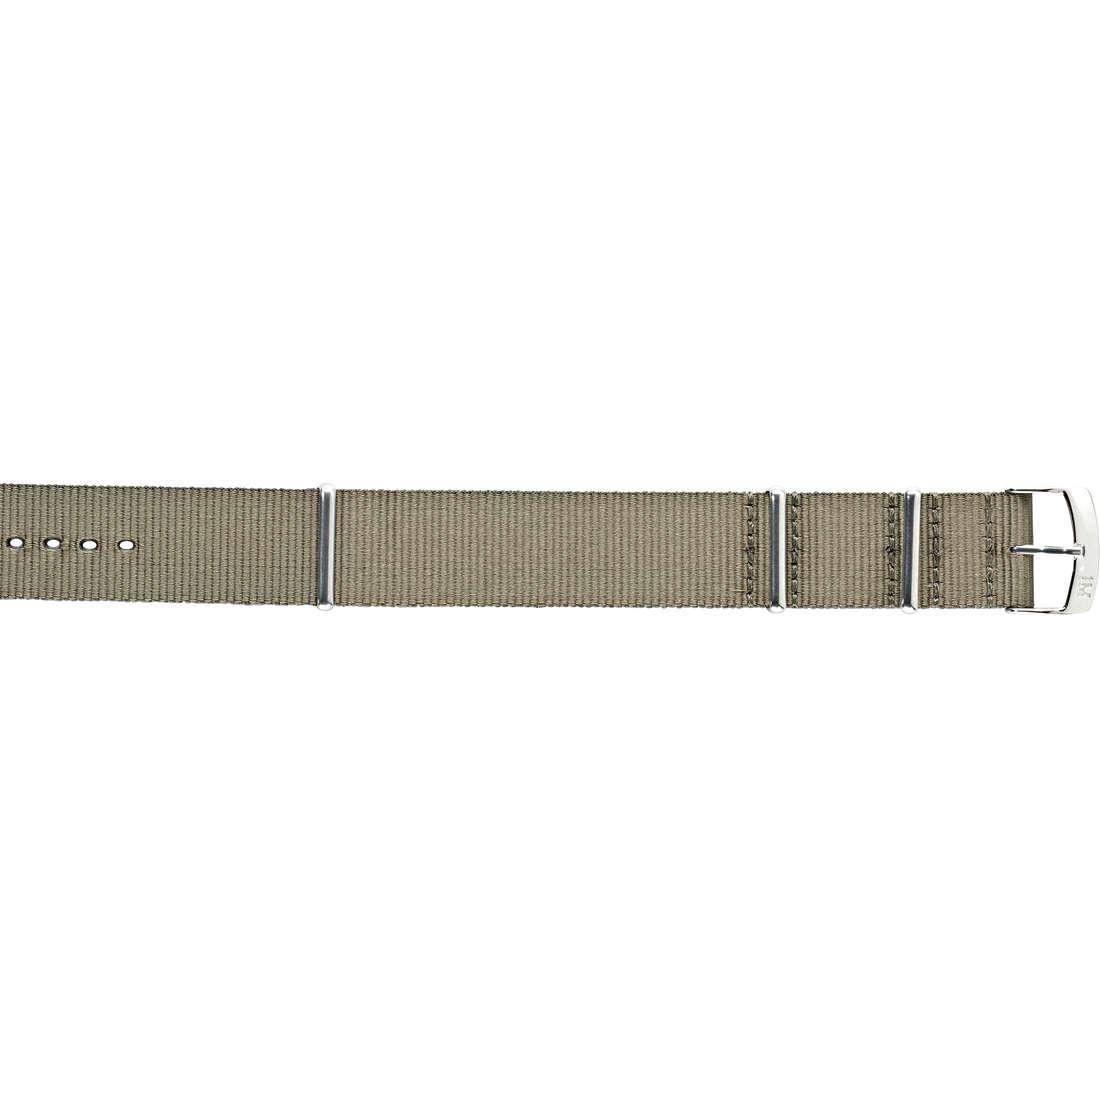 watch watch bands watch straps man Morellato Morellato 1930 A01U3972A74073CR20